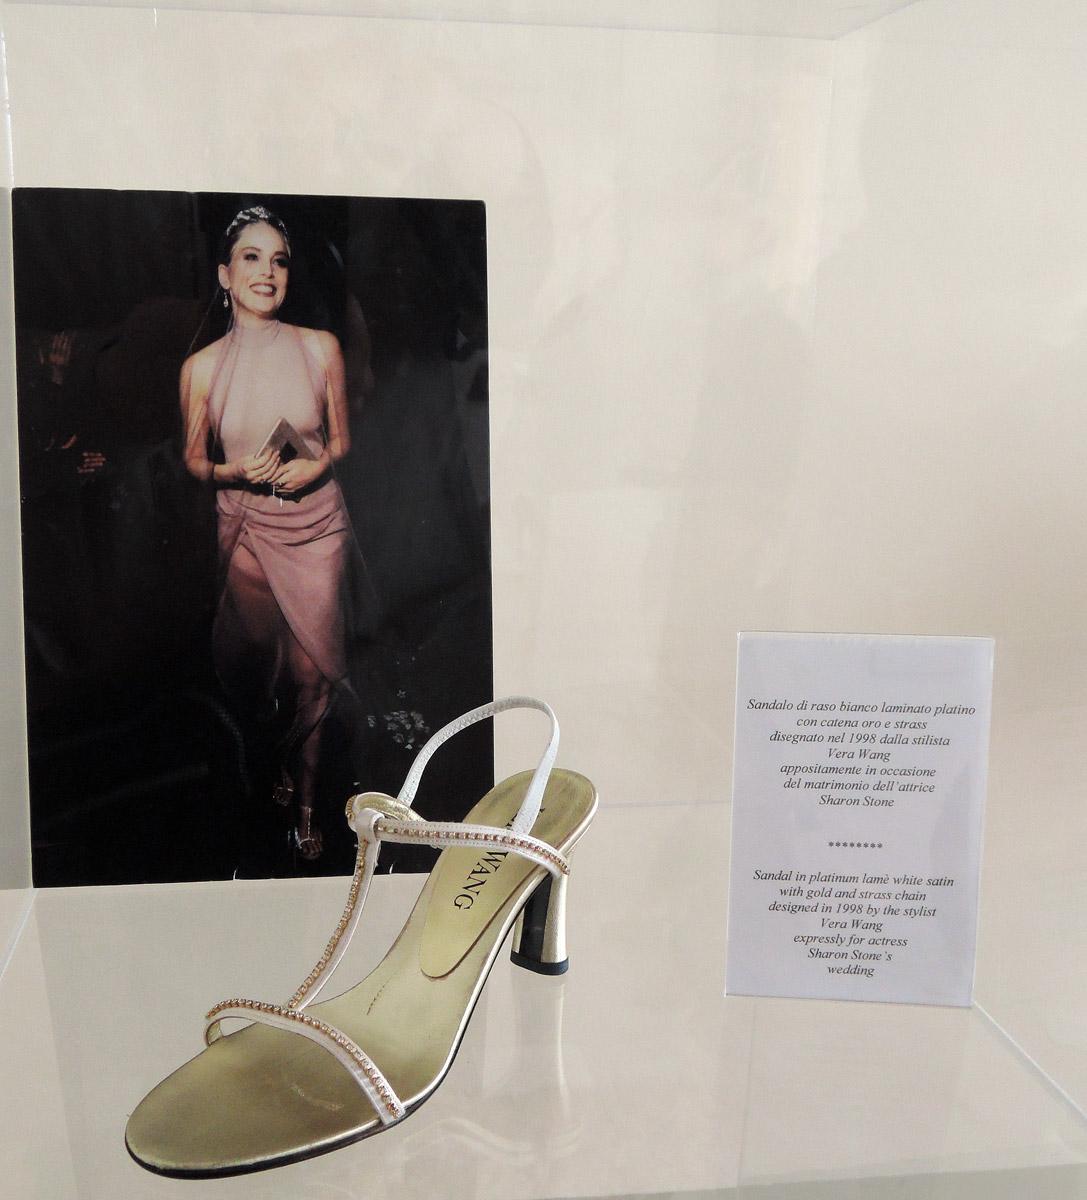 Sharon Stone's wedding shoes by Vera Wang